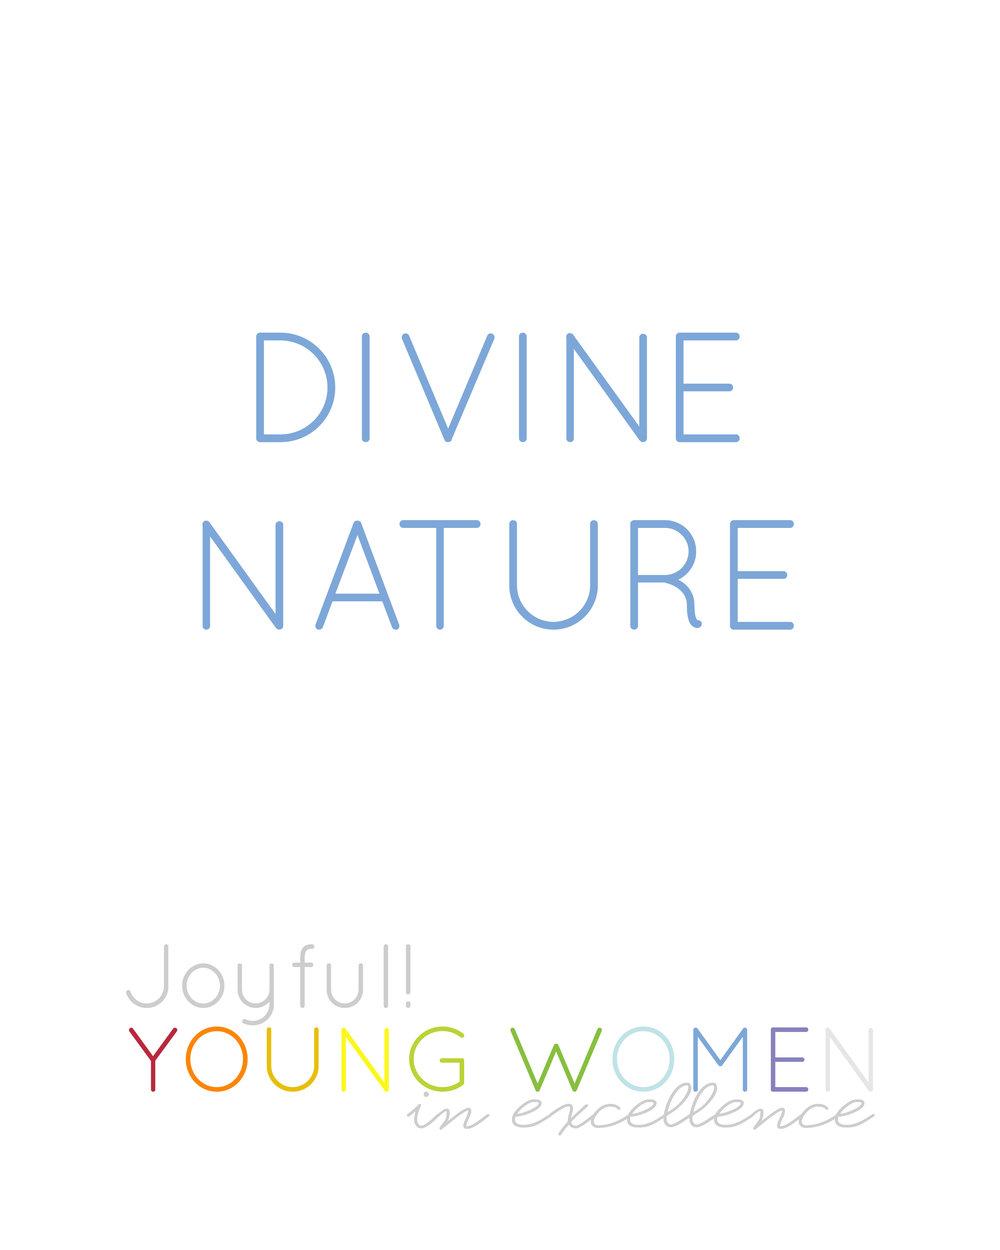 Amber Brittain-Hale November 2016 Divine Nature.jpg